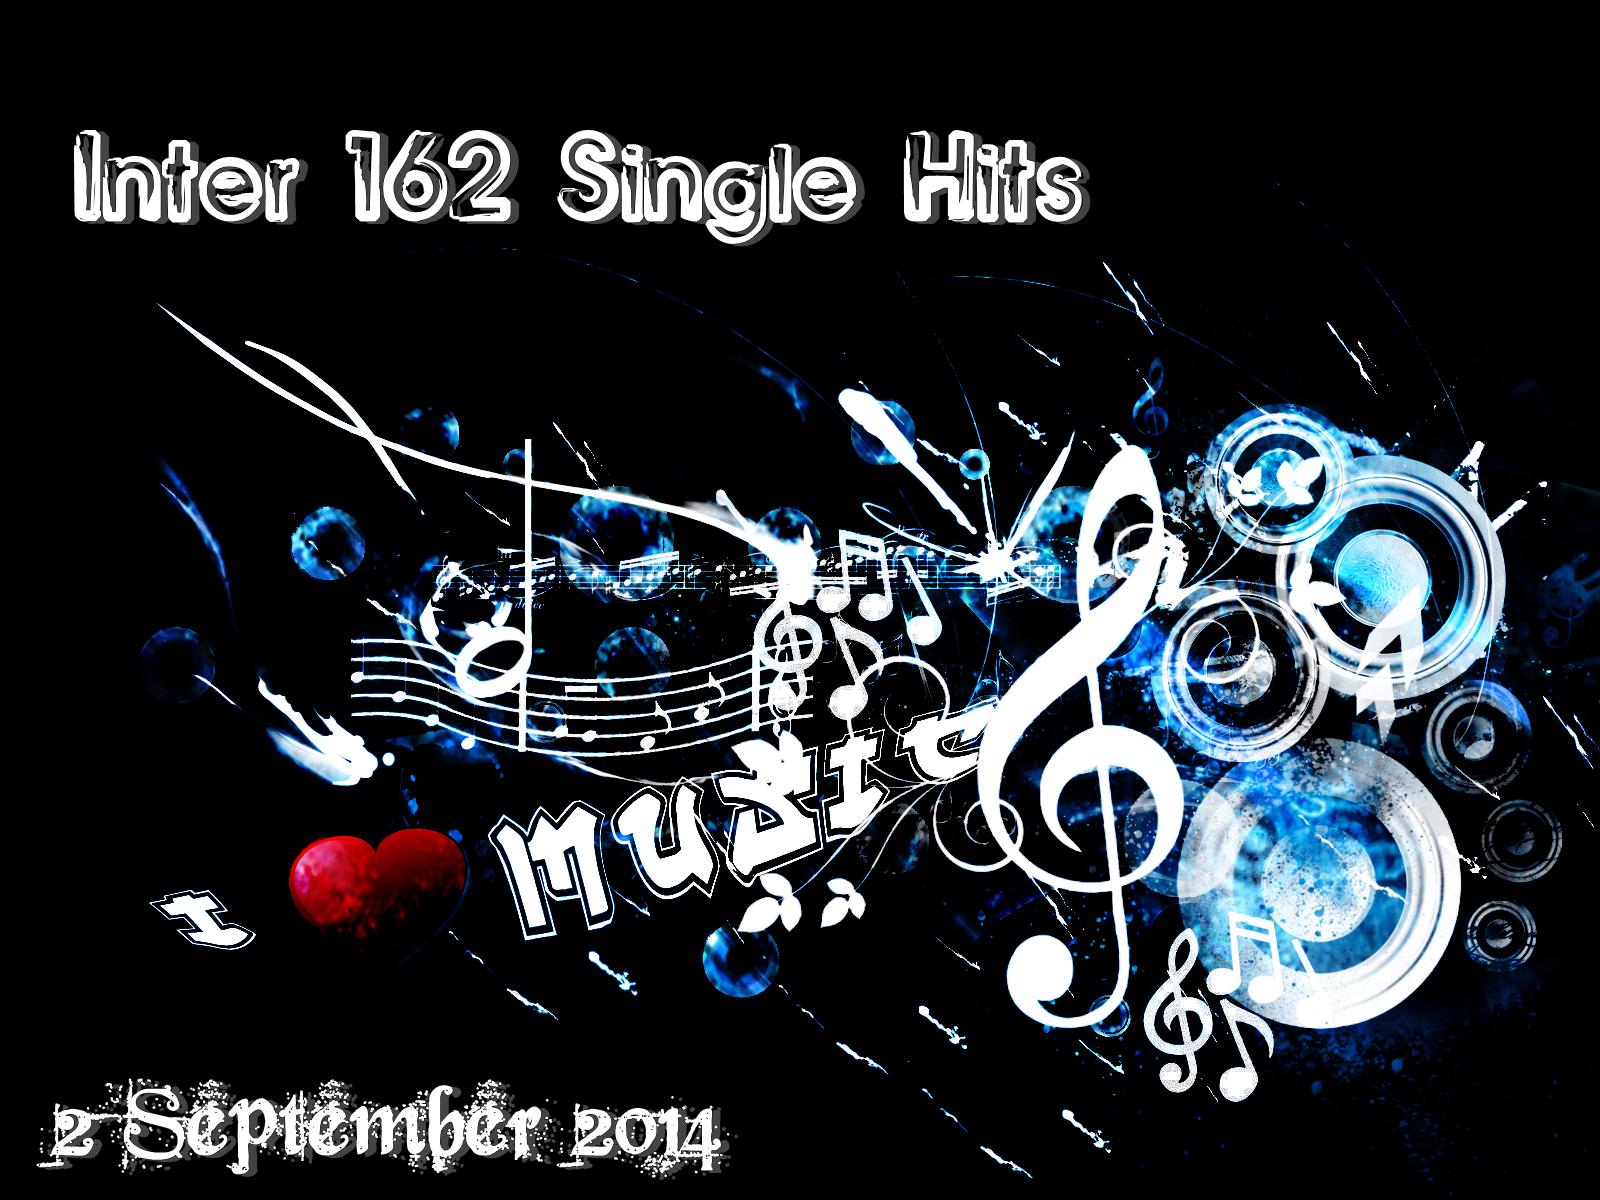 Download [Mp3]-[Hot New] ใหม่! เพลงสากลฮิตติดชาร์ท มันส์สนุกทุกเพลง ในชุด Inter 162 Single Hits ออกวันที่ 2 September 2014 [Solidfiles] 4shared By Pleng-mun.com